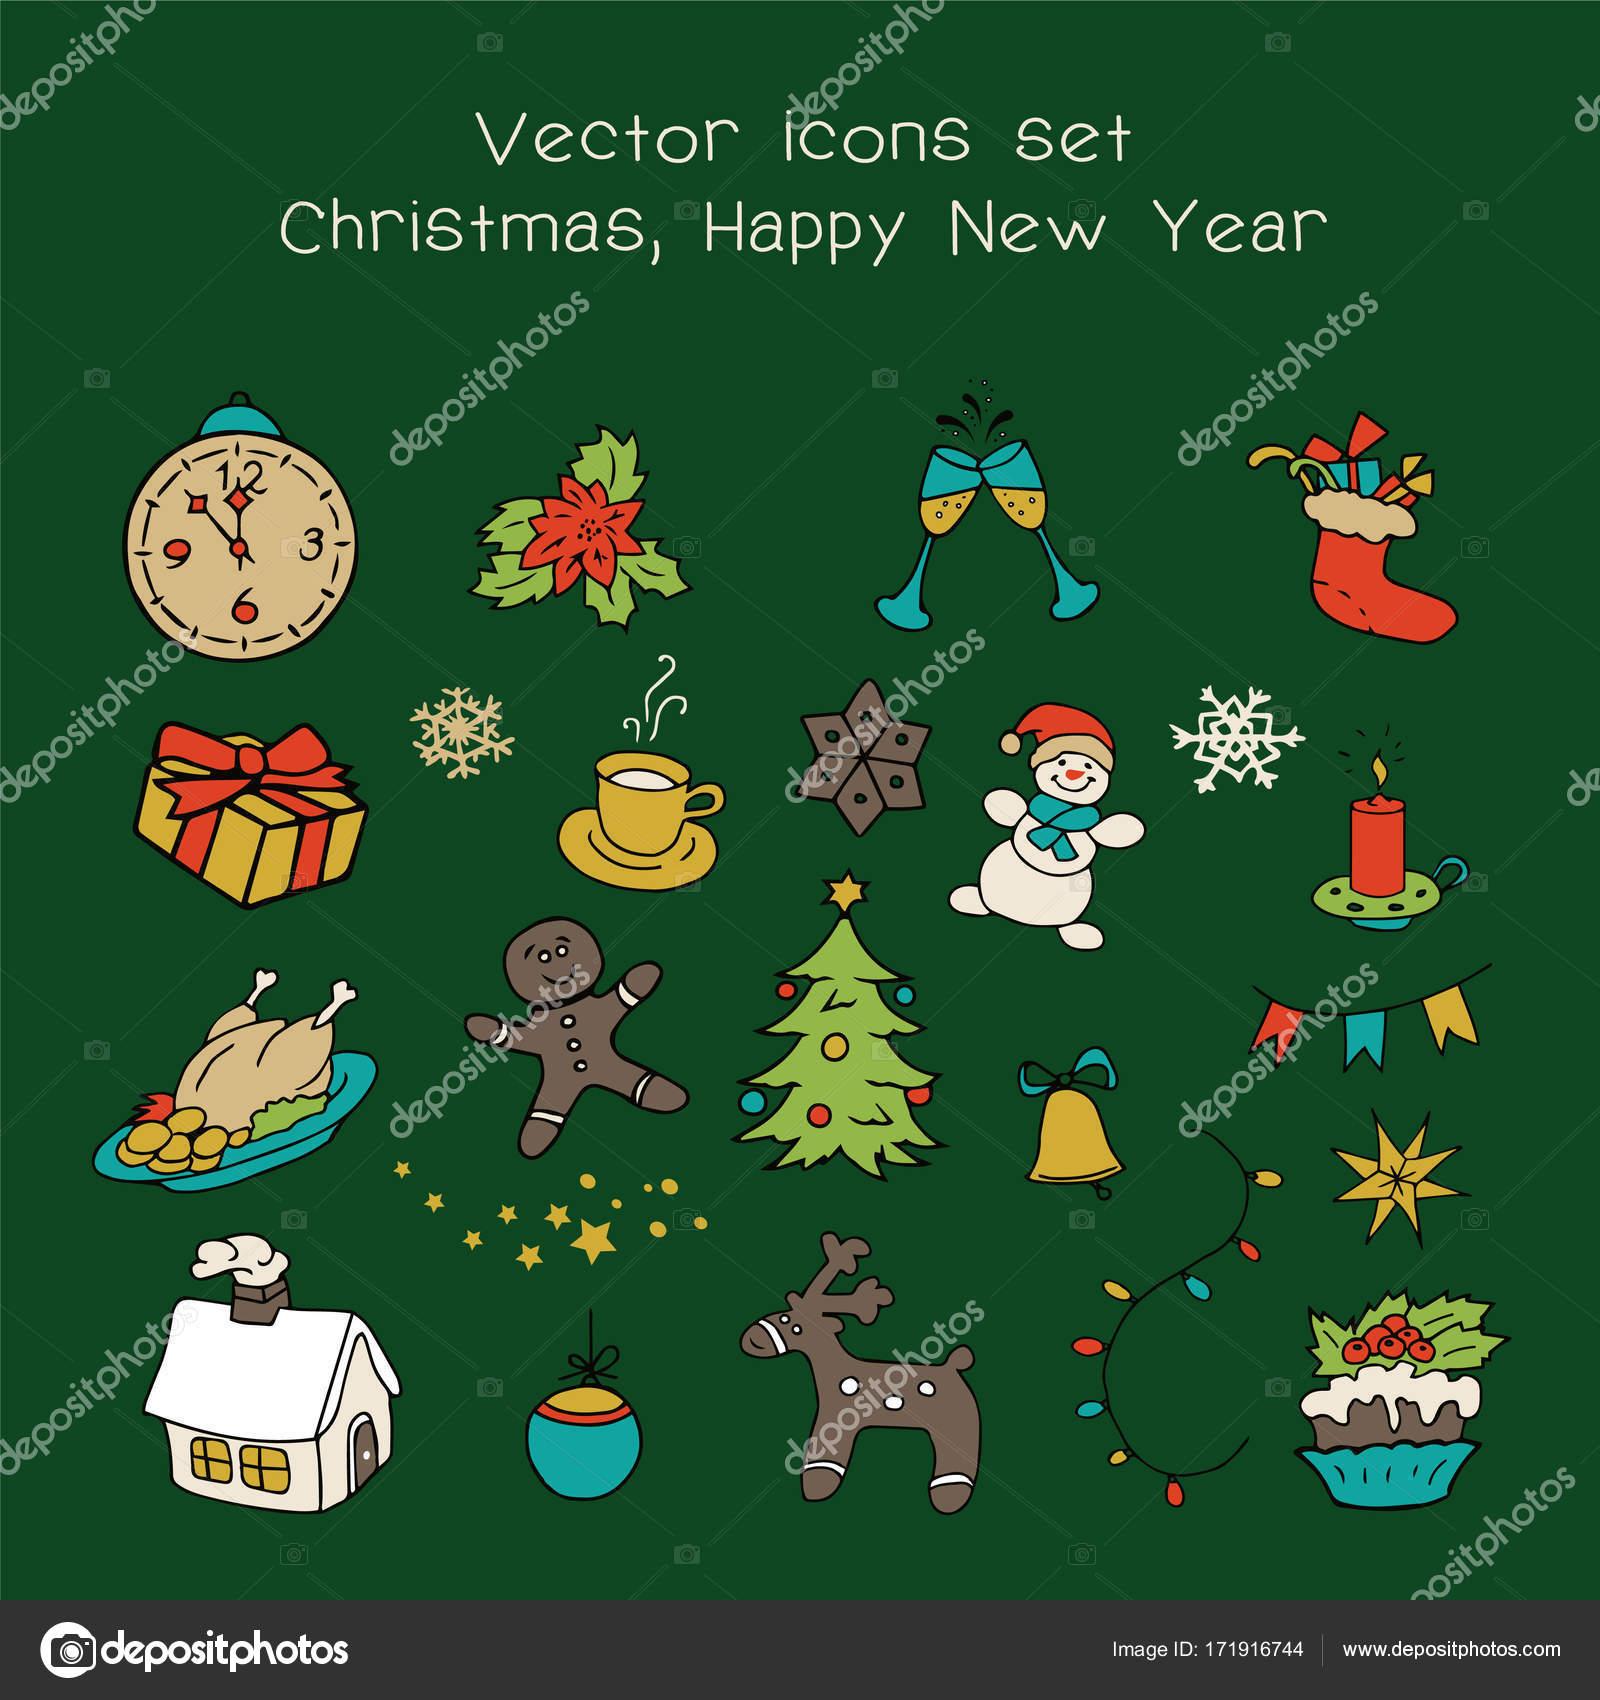 Christmas Holidays Icon.Christmas Holidays Icon Set Classic Hand Drawn New Year